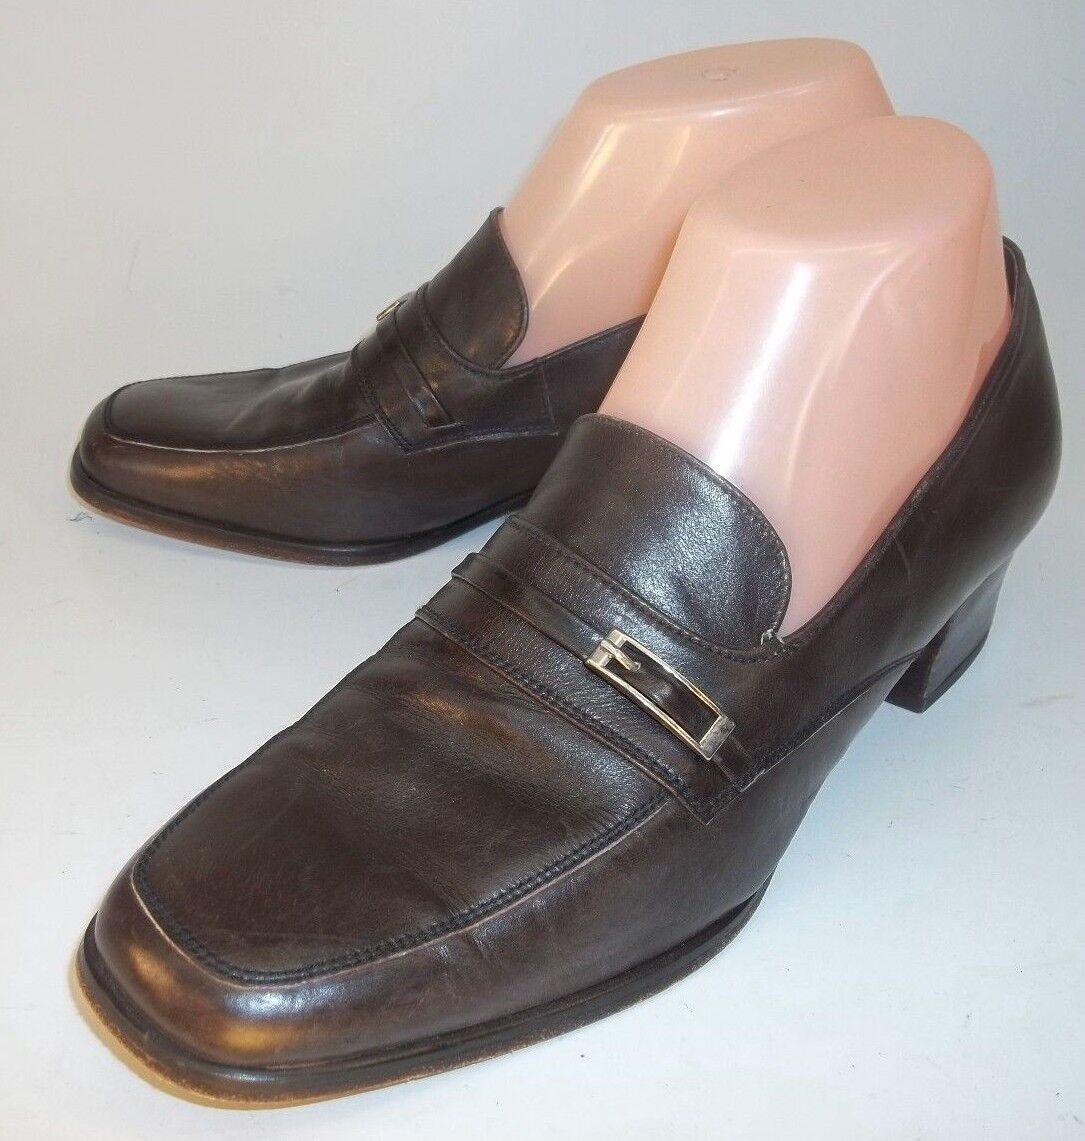 Pepe Catala Mallorca Wos Loafer Heels EU 37 marron Leather Work Dress  380